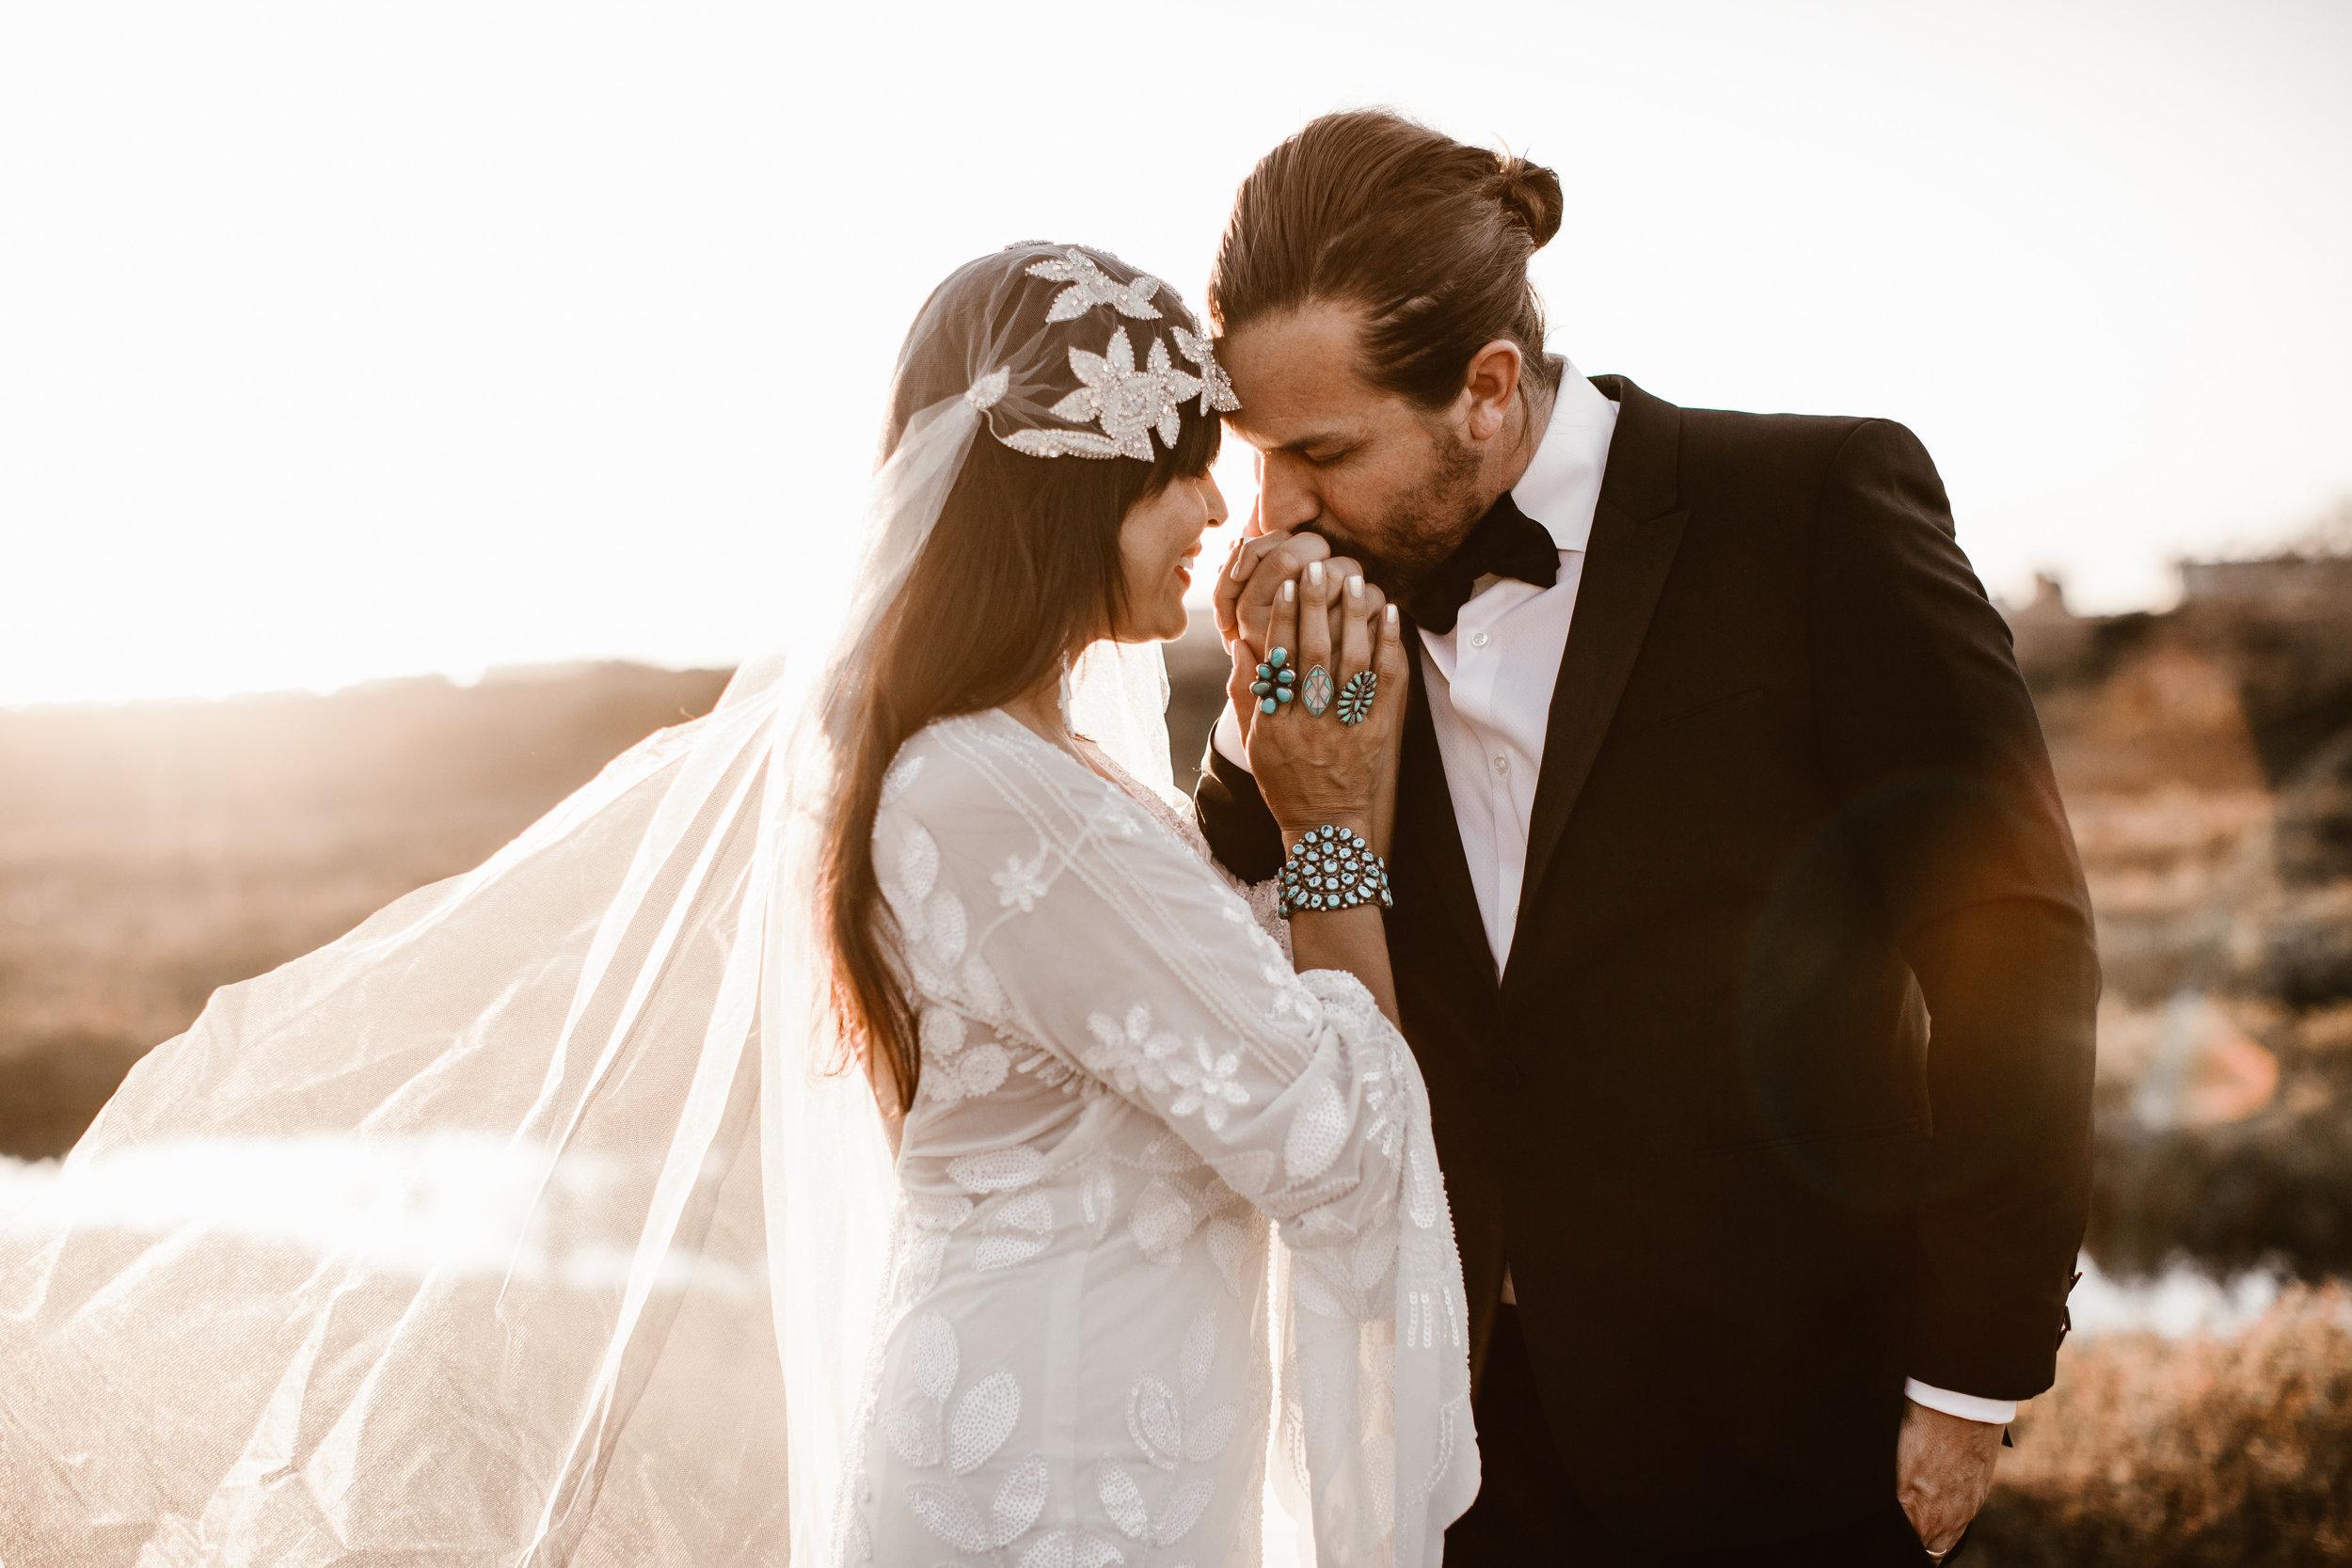 Real Bride wearing Untamed Petals Berlin Cap veil